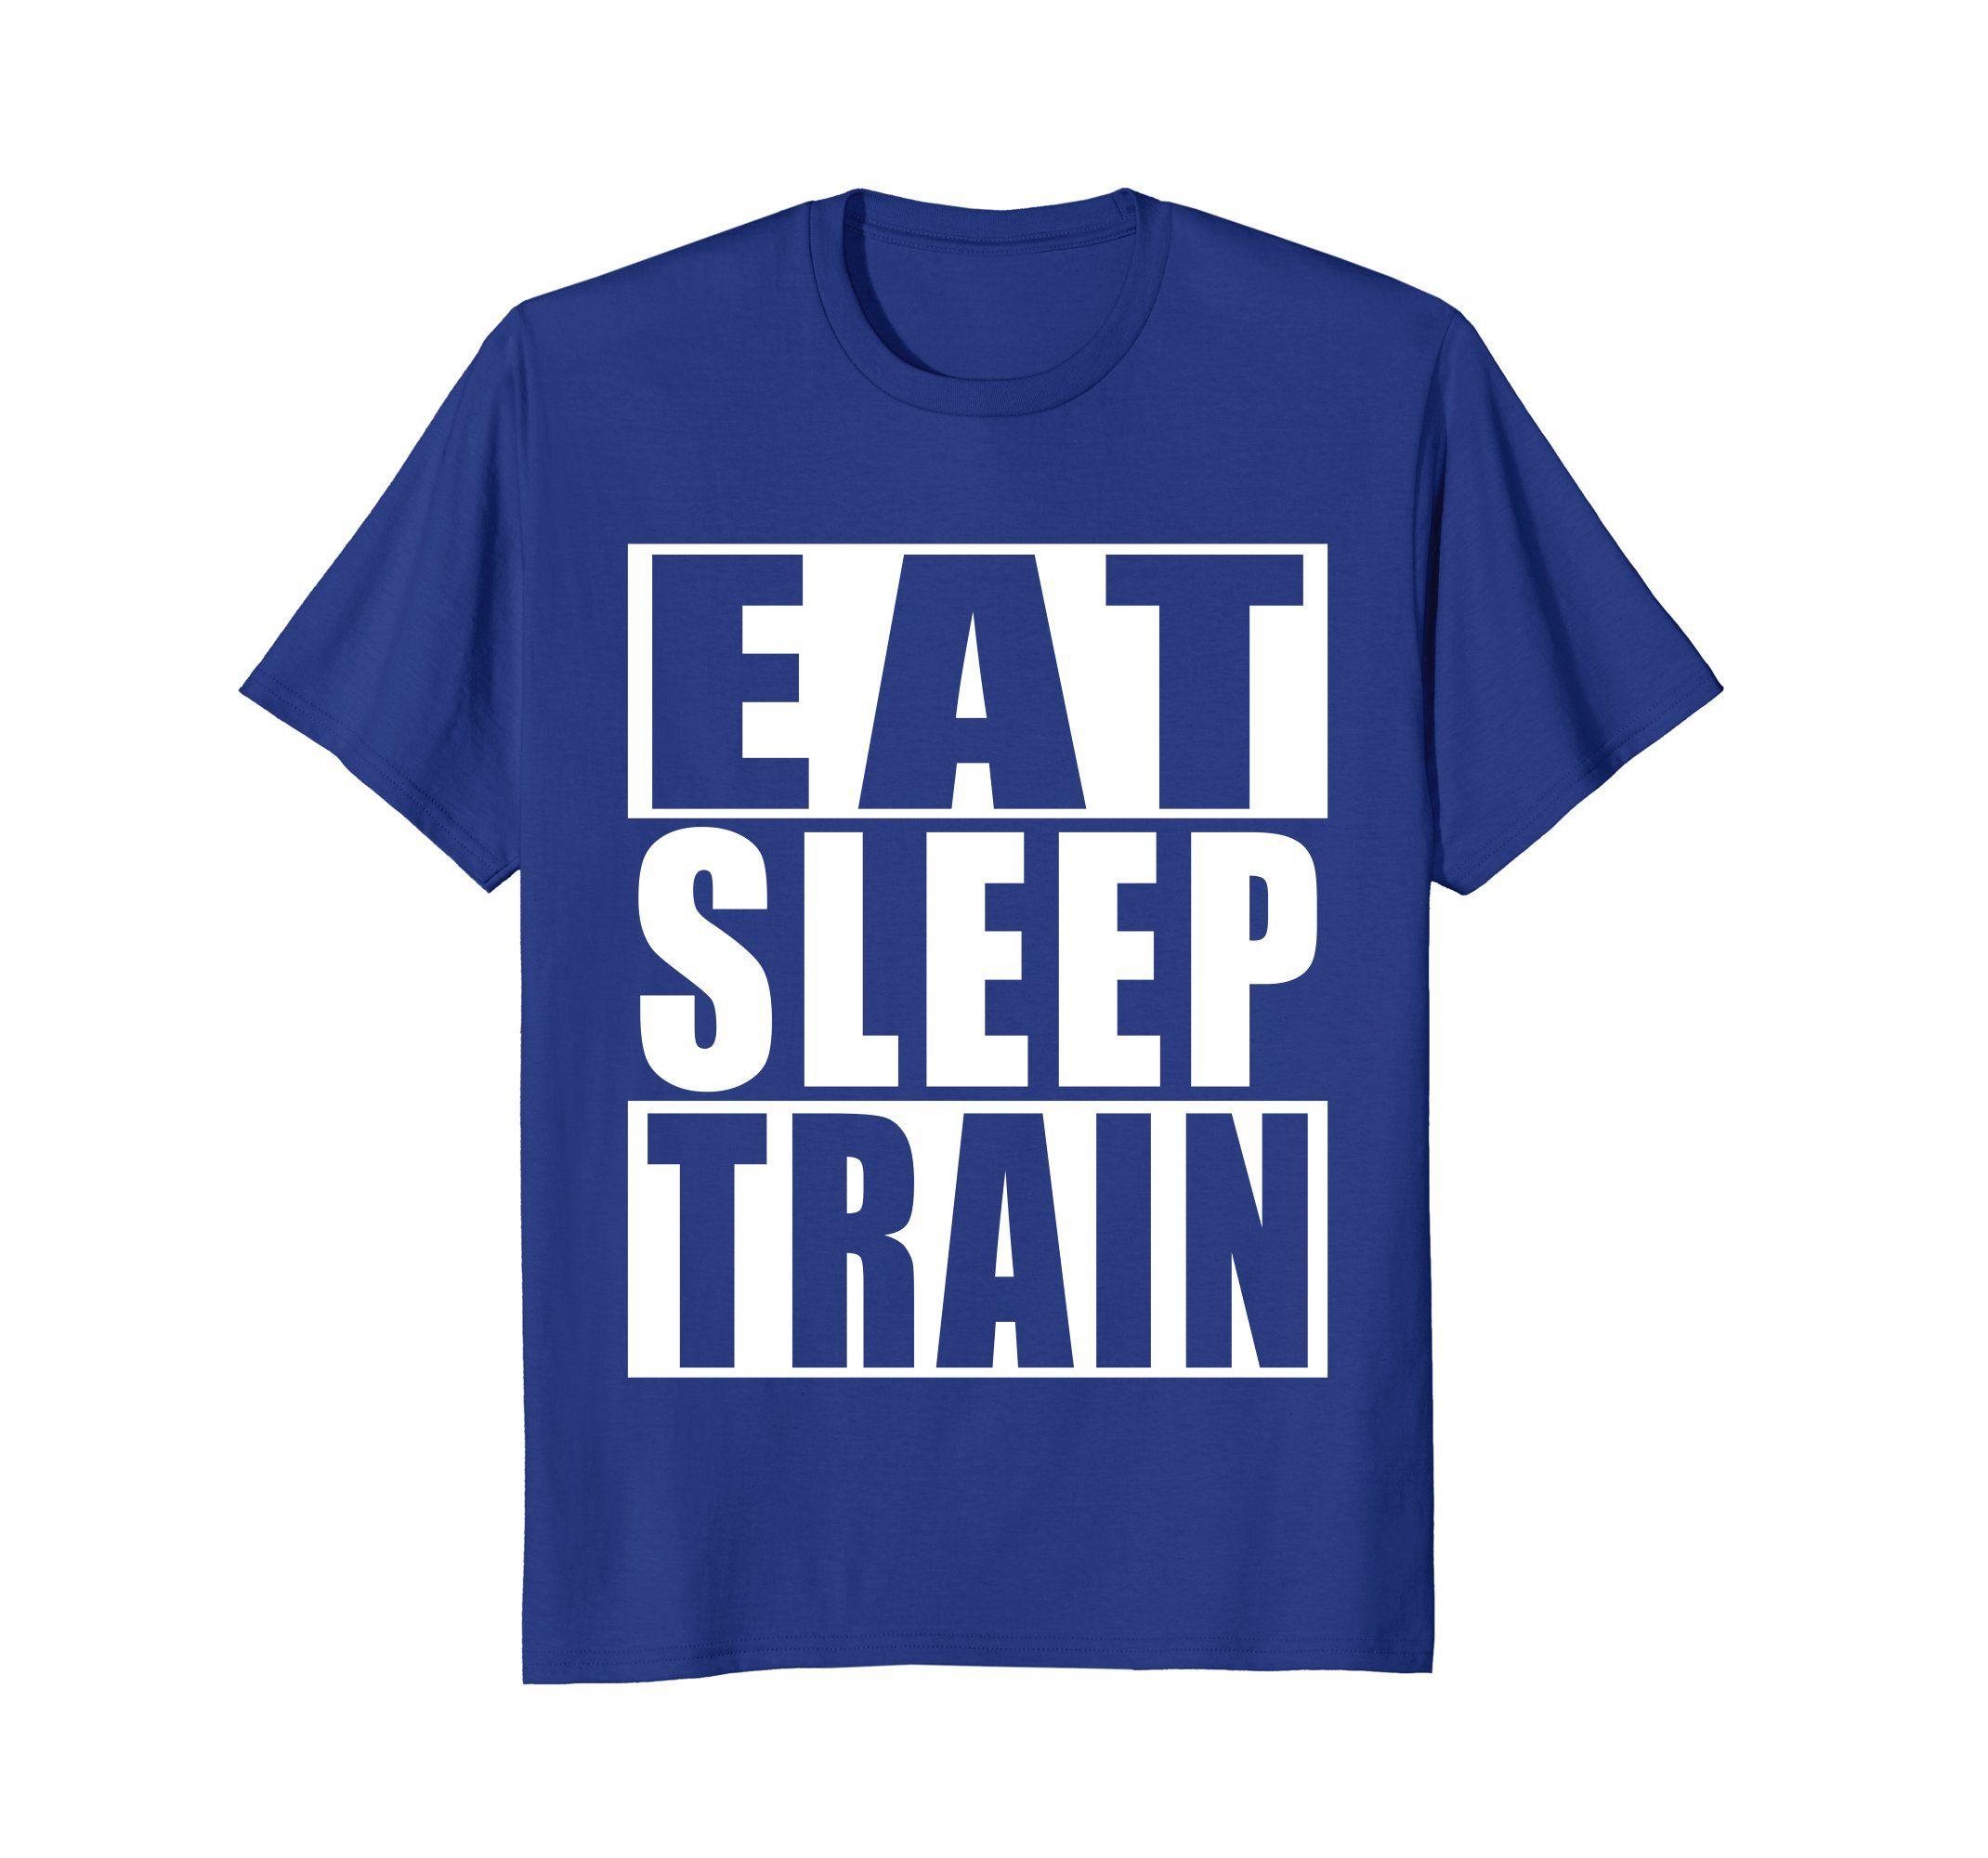 dd8a83c043 Amazon.com: Eat, Sleep, Fitness Training, Gym T-shirt: Clothing ...